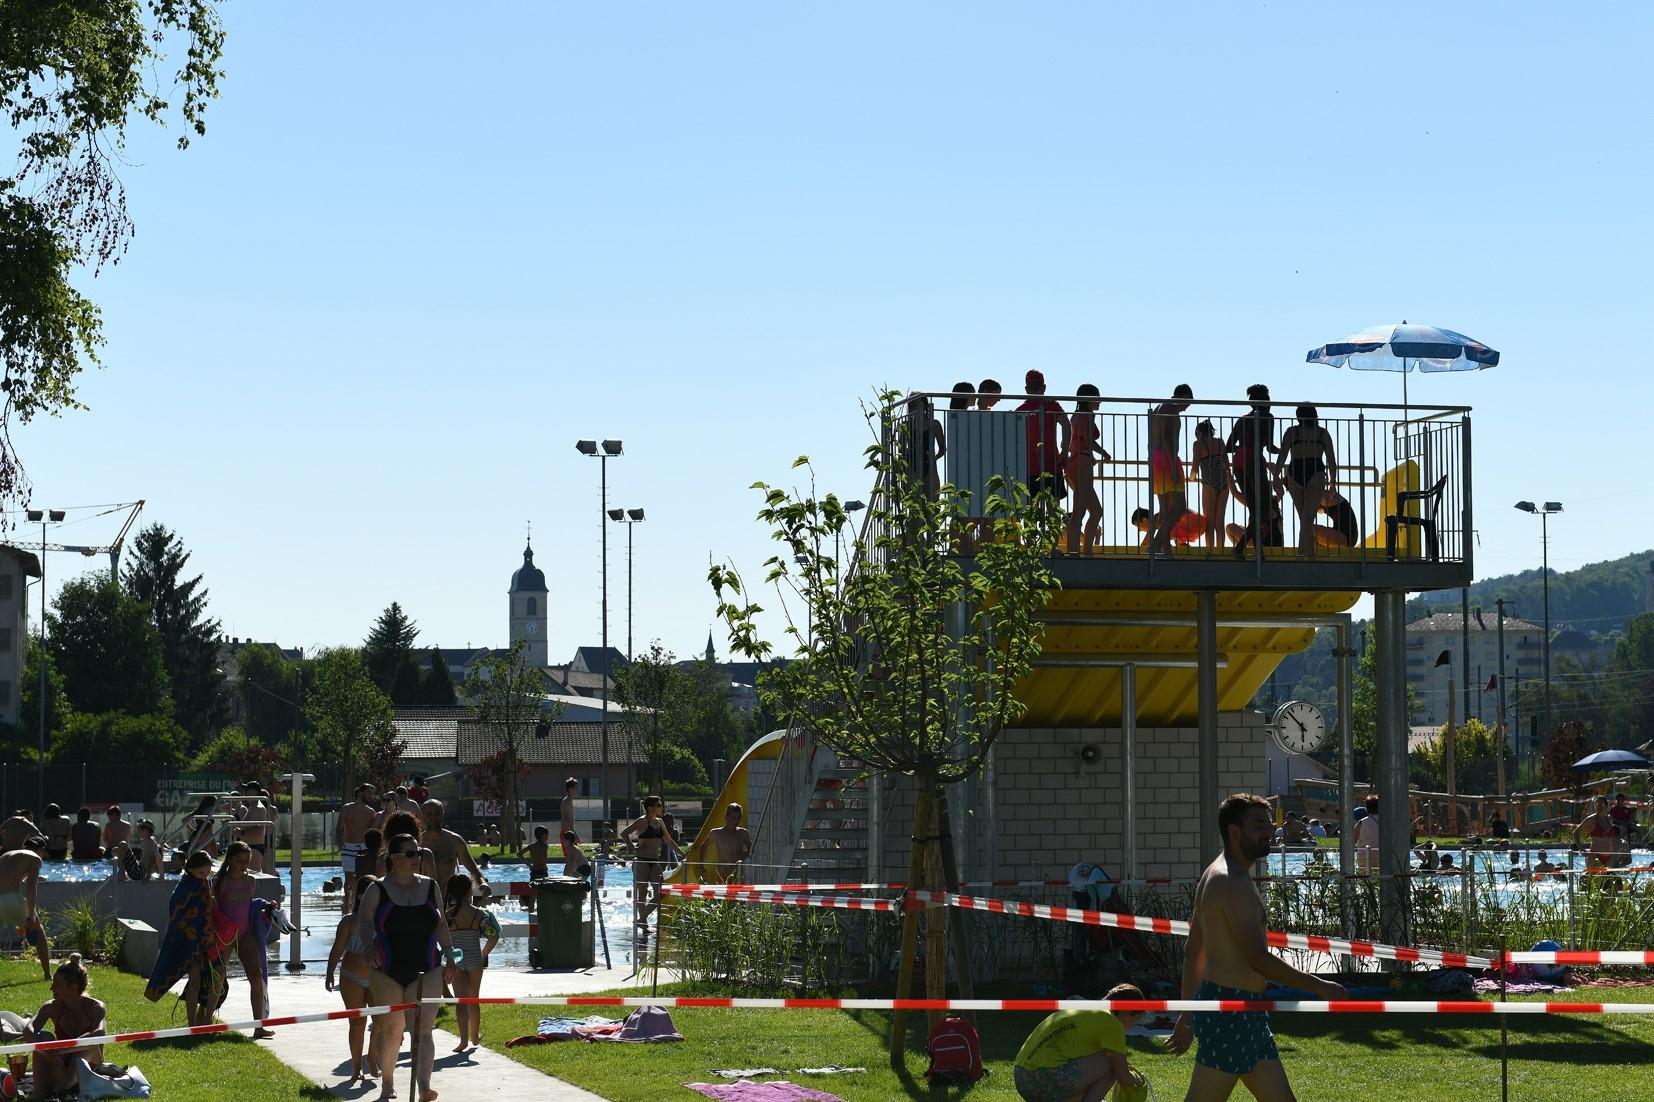 Inauguration De La Piscine Municipale | Ville De Porrentruy concernant Piscine Porrentruy